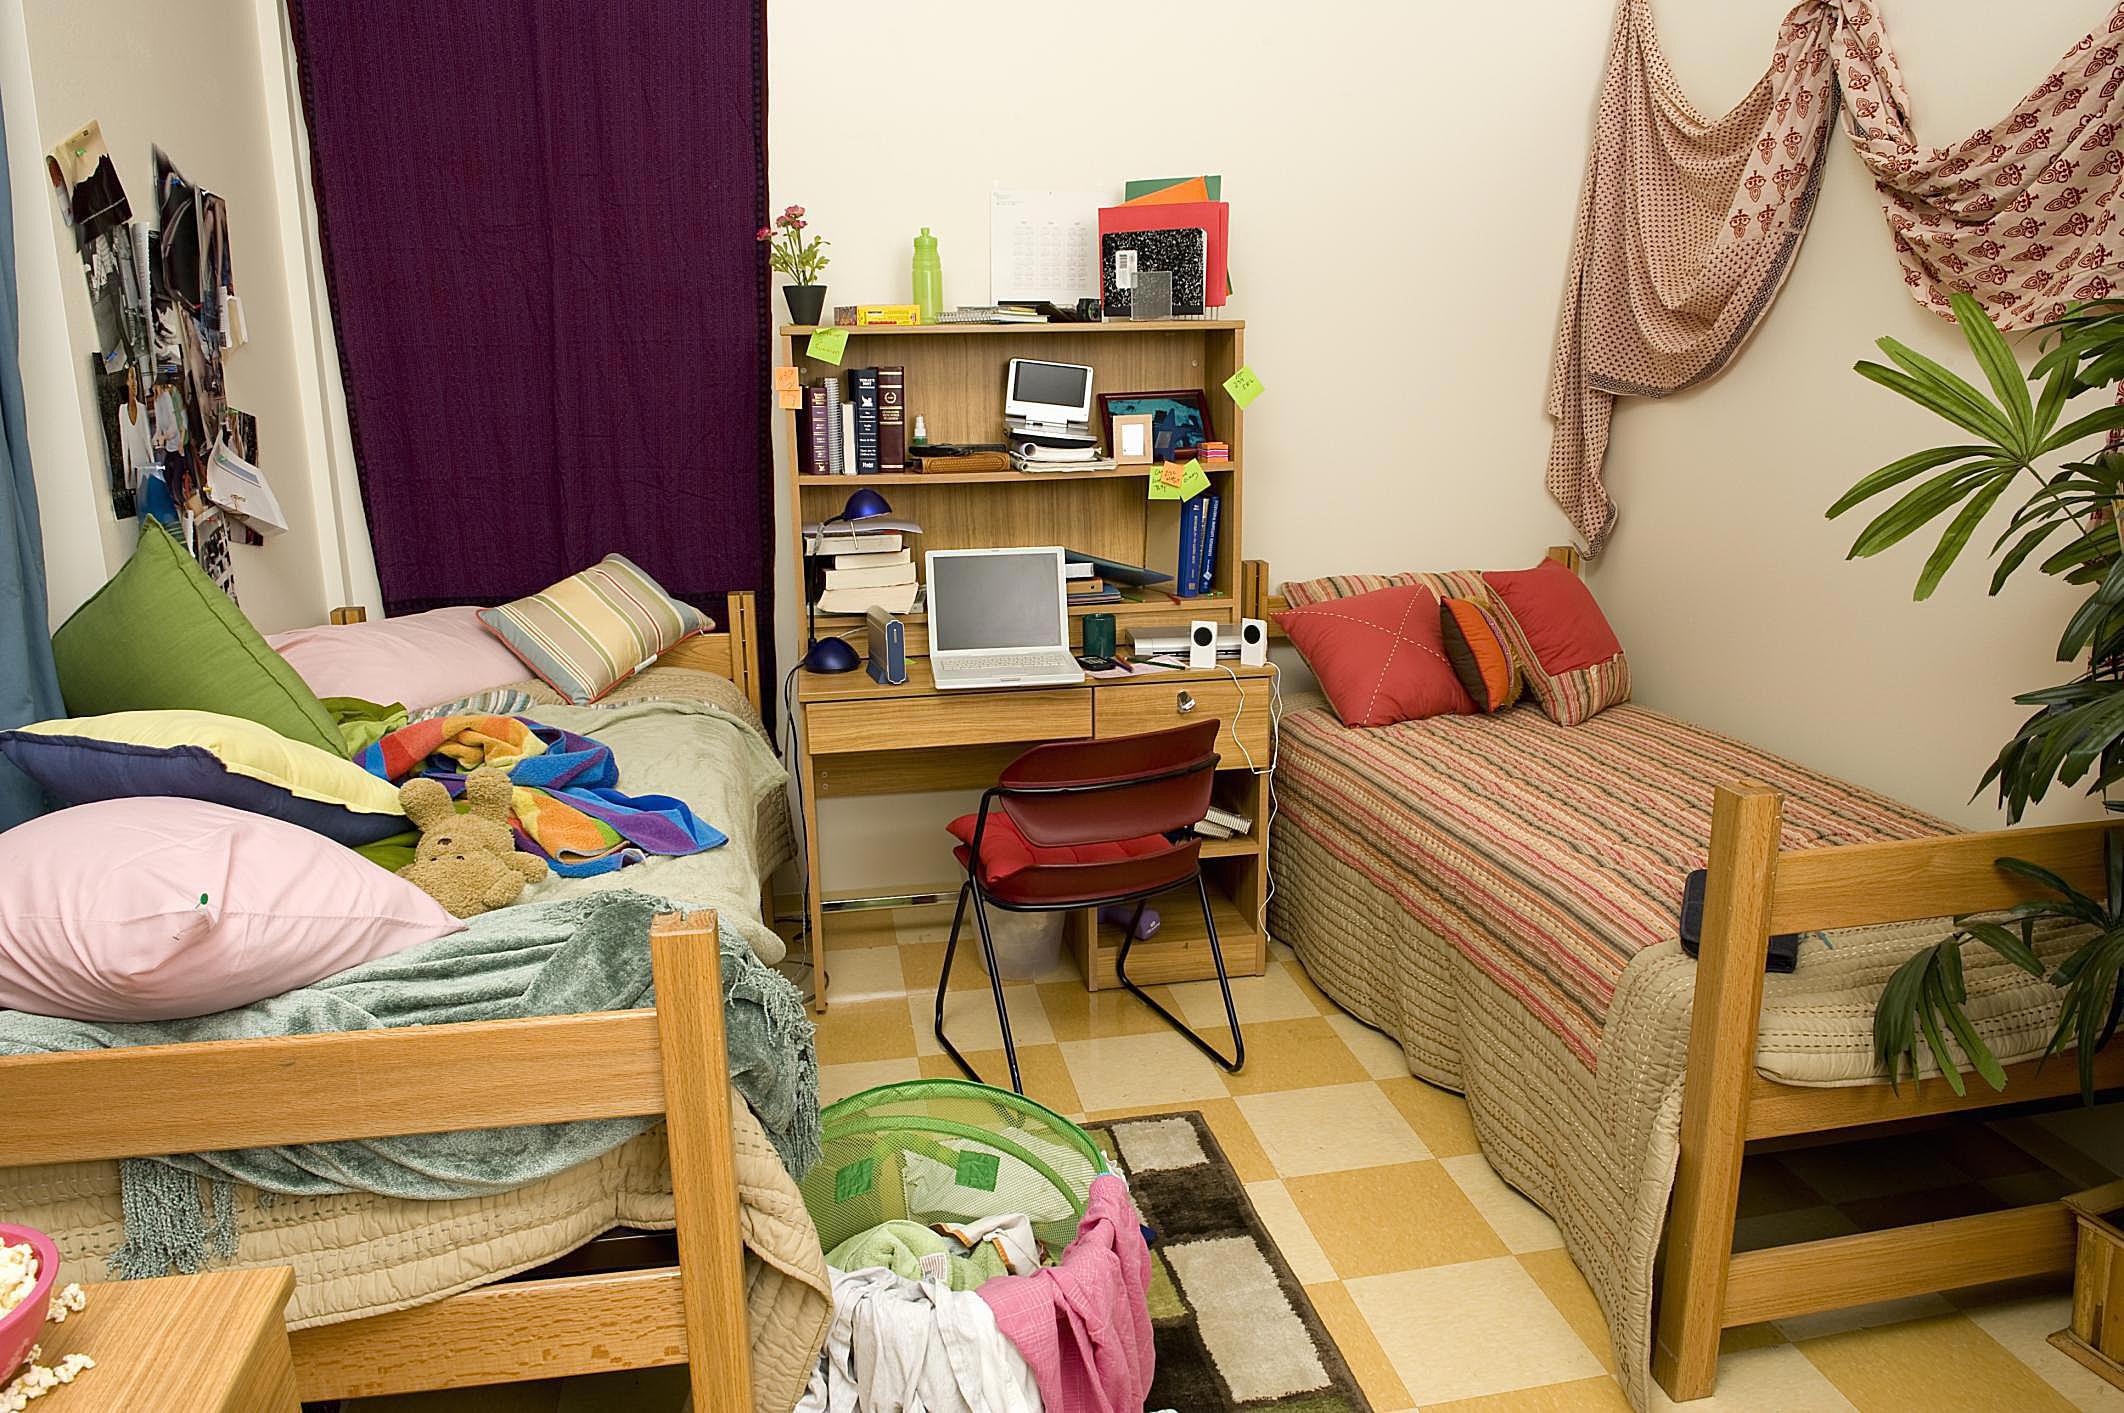 diy dorm decorating ideas tutorials tips videos. Black Bedroom Furniture Sets. Home Design Ideas